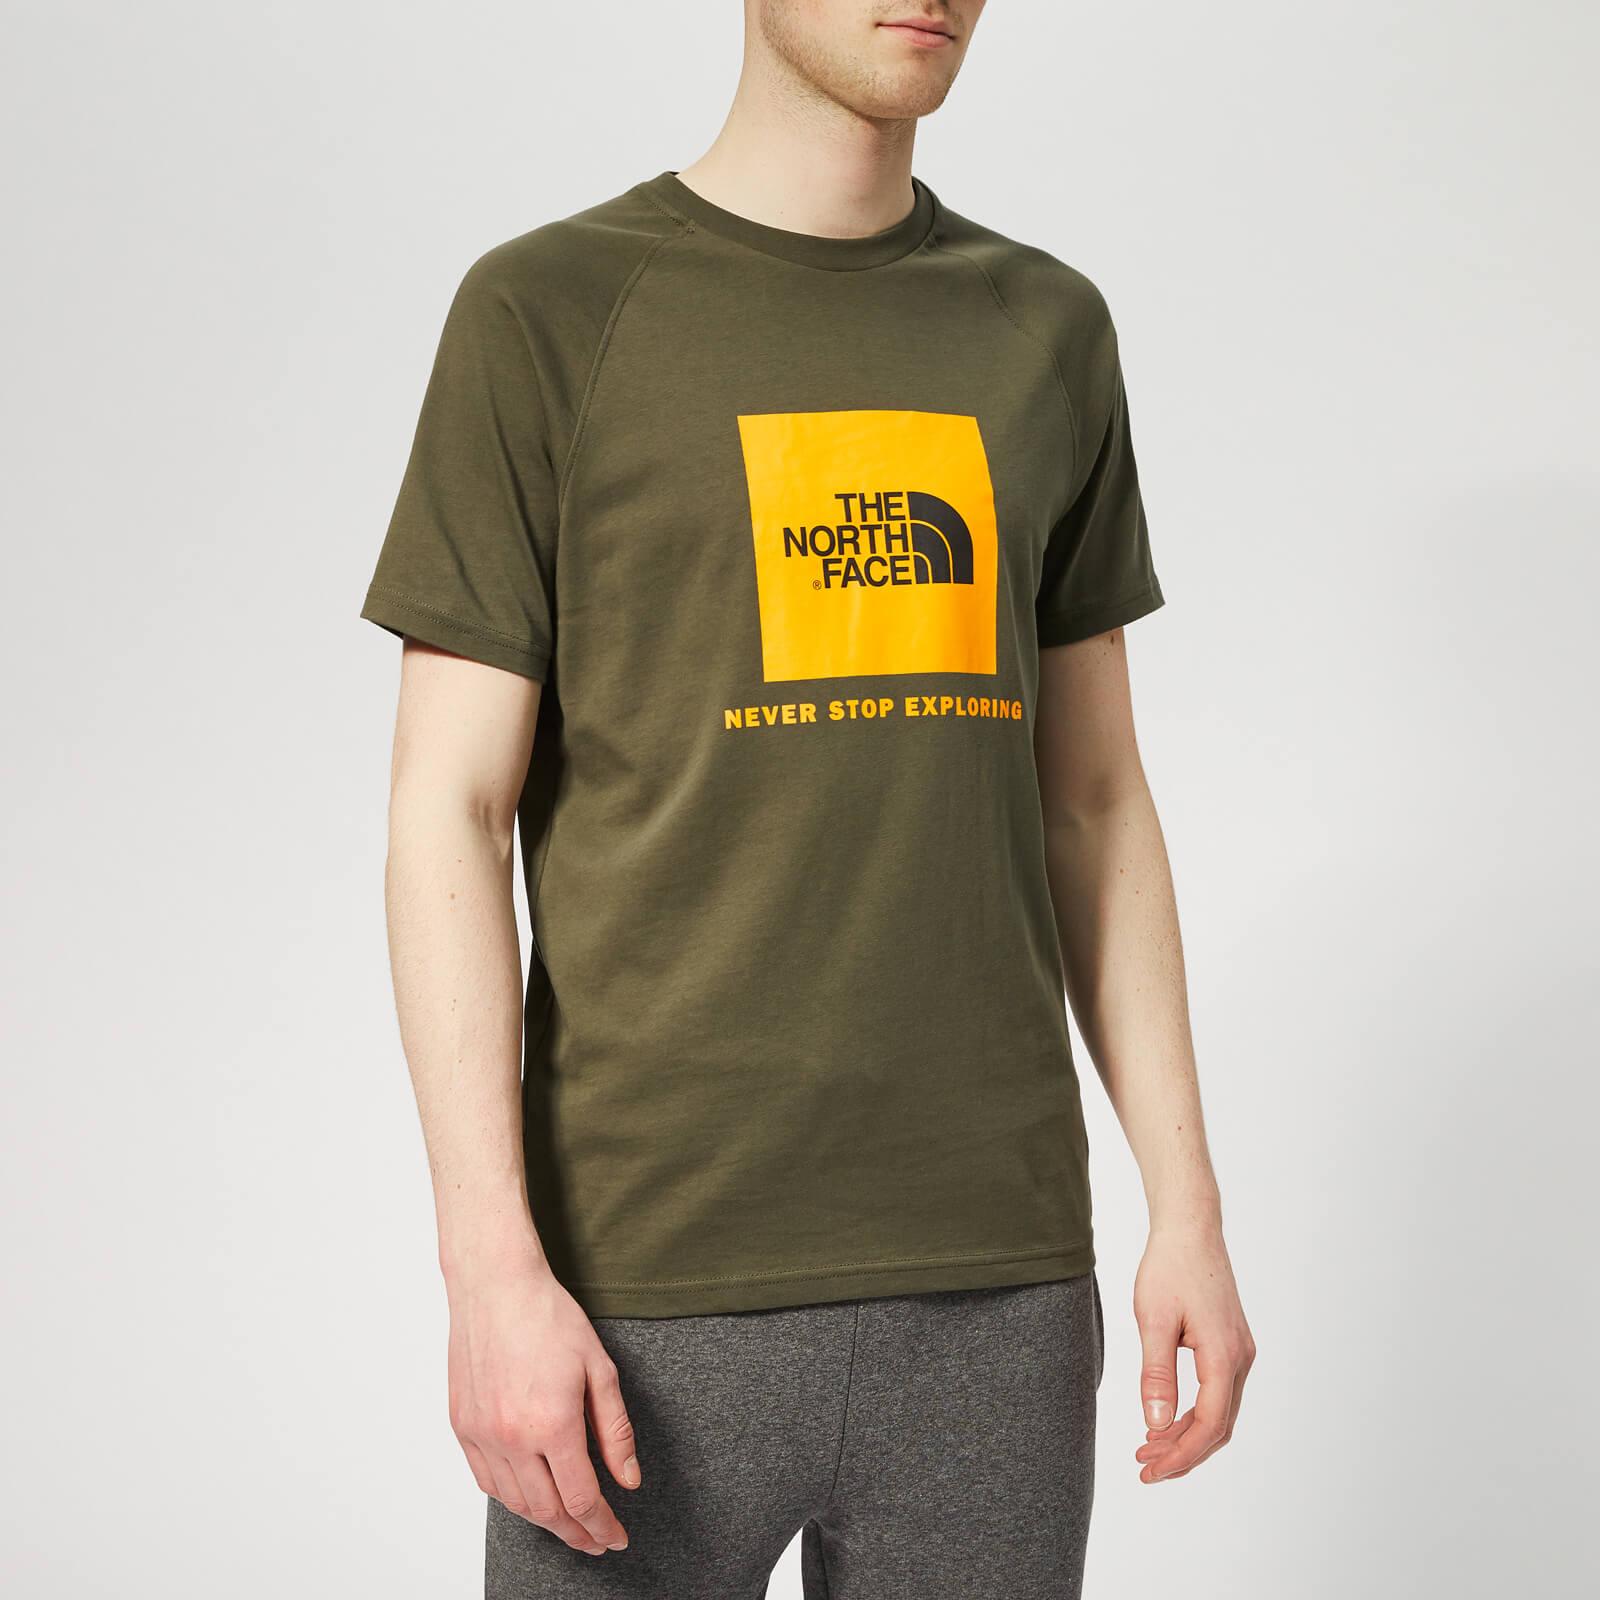 c53d1f5ec The North Face Men's Raglan Redbox Short Sleeve T-Shirt - New Taupe Green